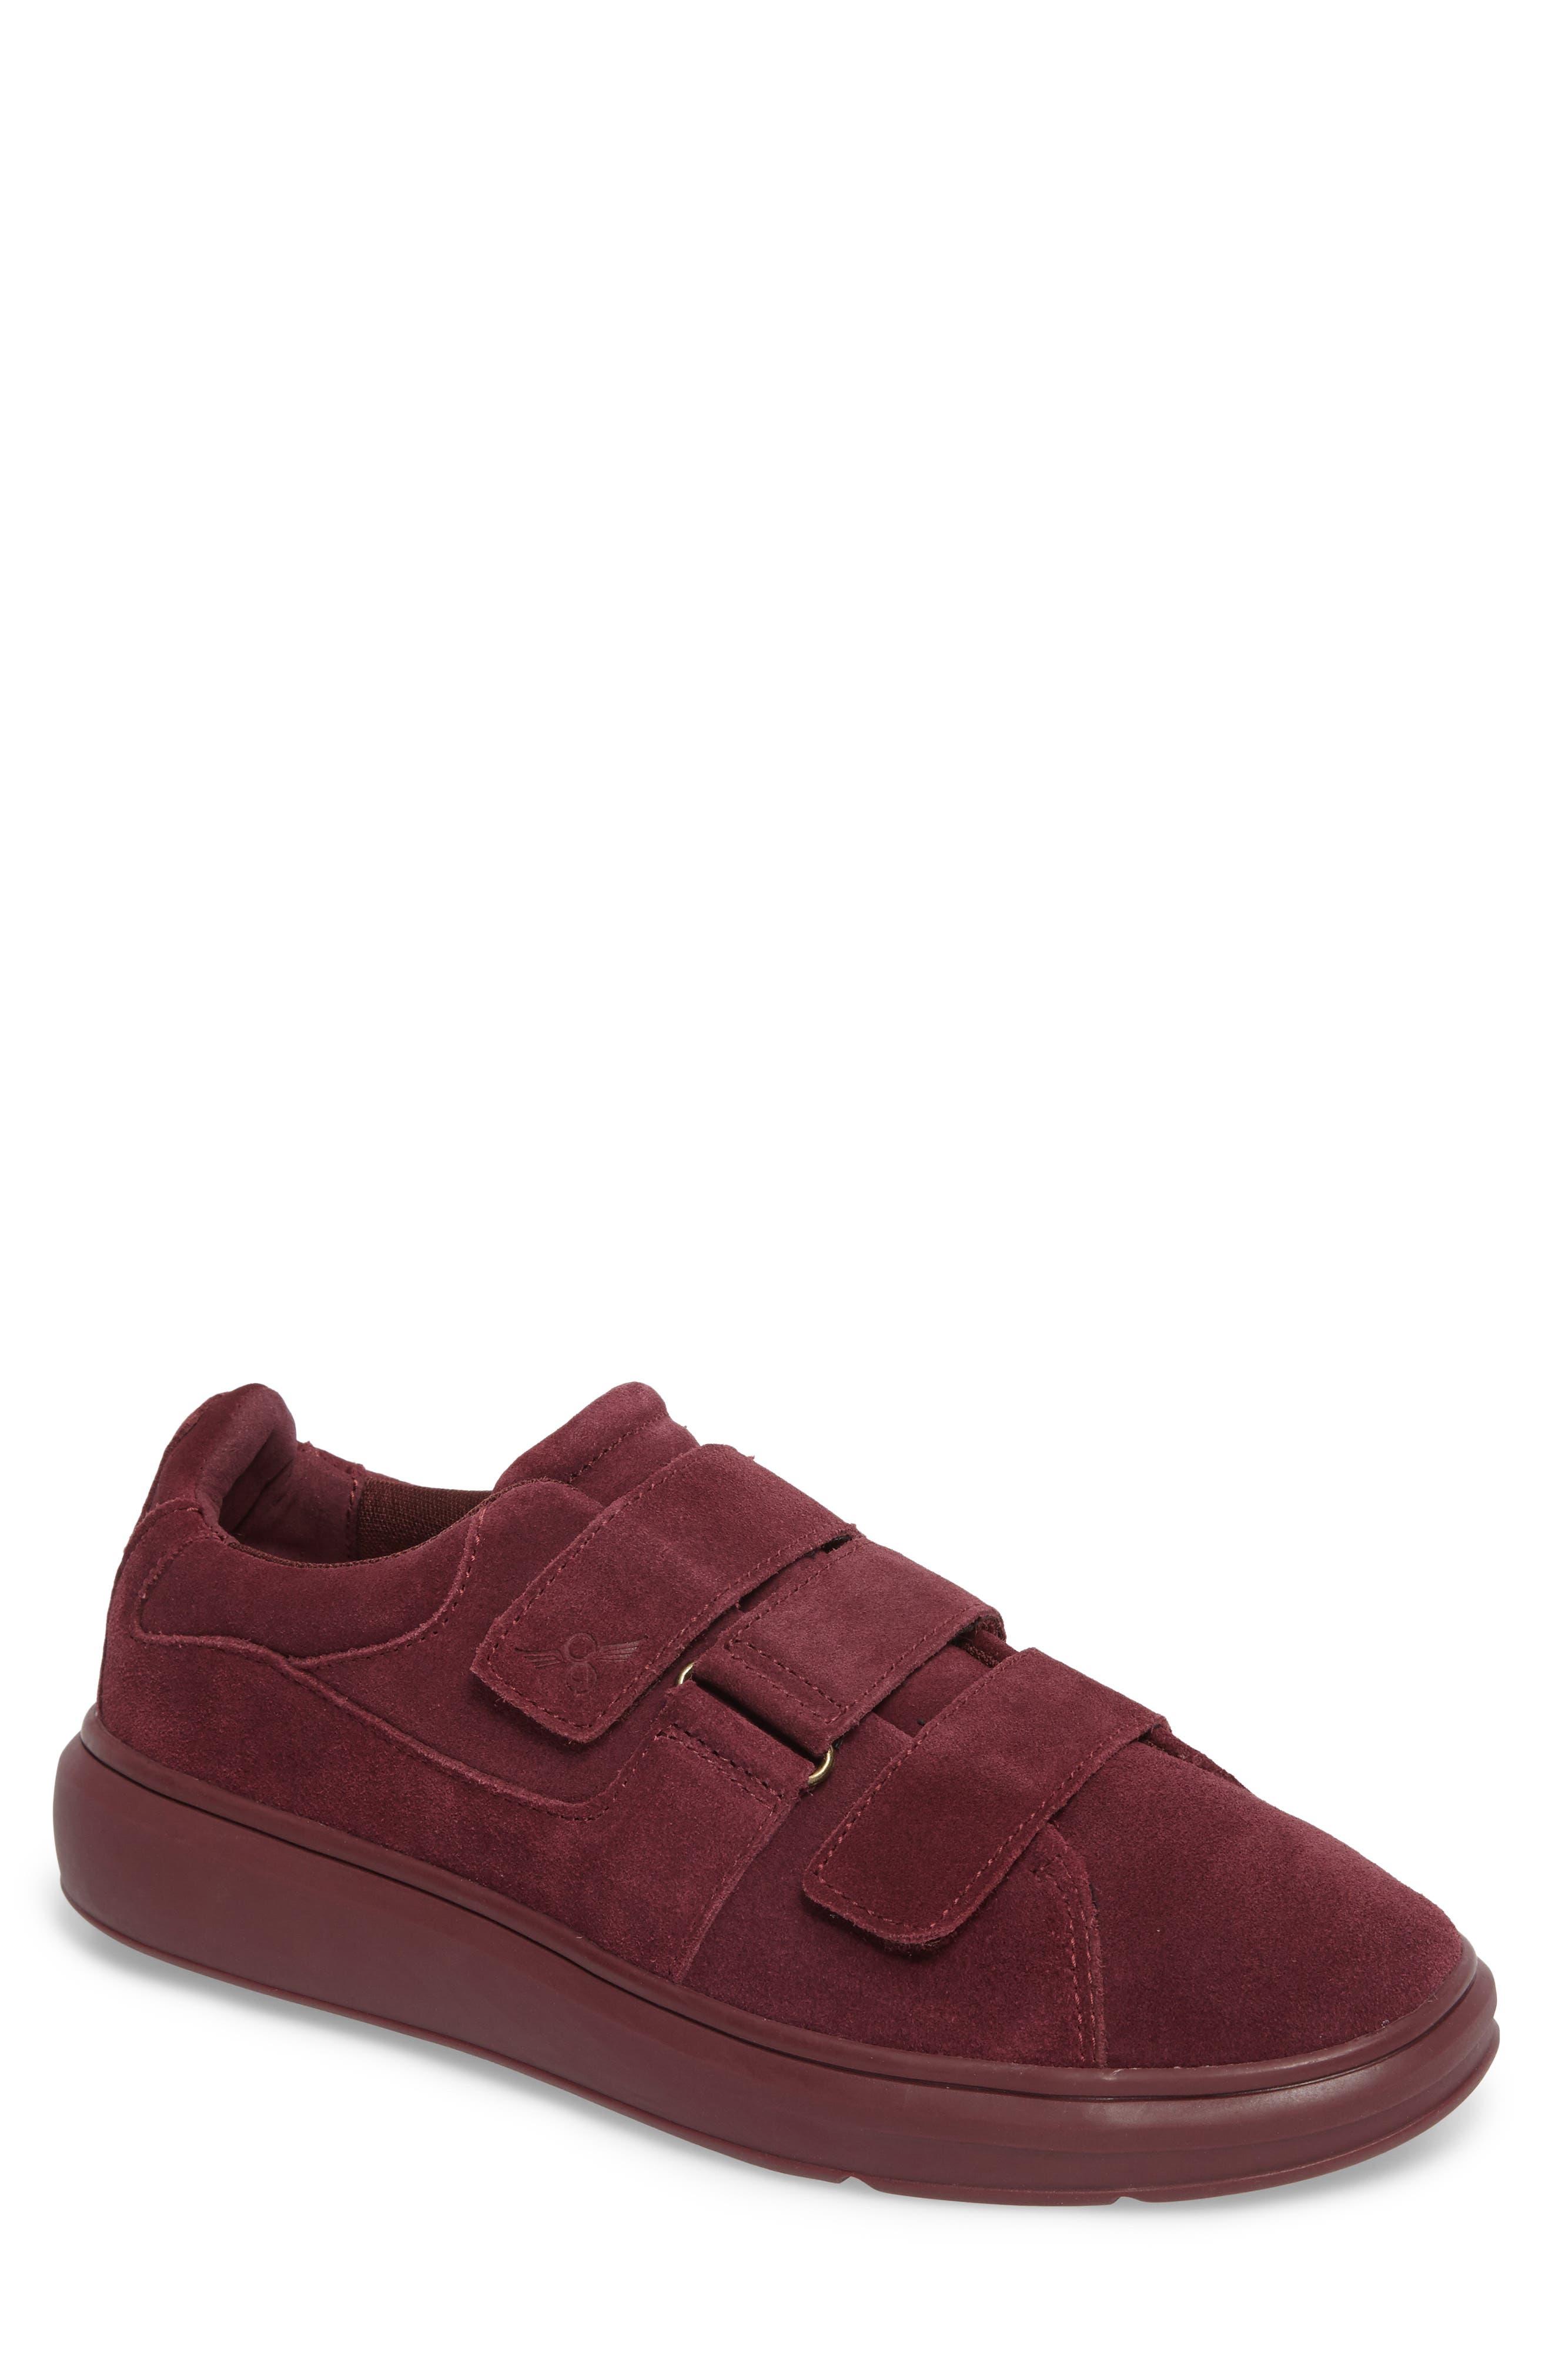 Meleti Sneaker,                             Main thumbnail 1, color,                             Dark Burgundy Leather